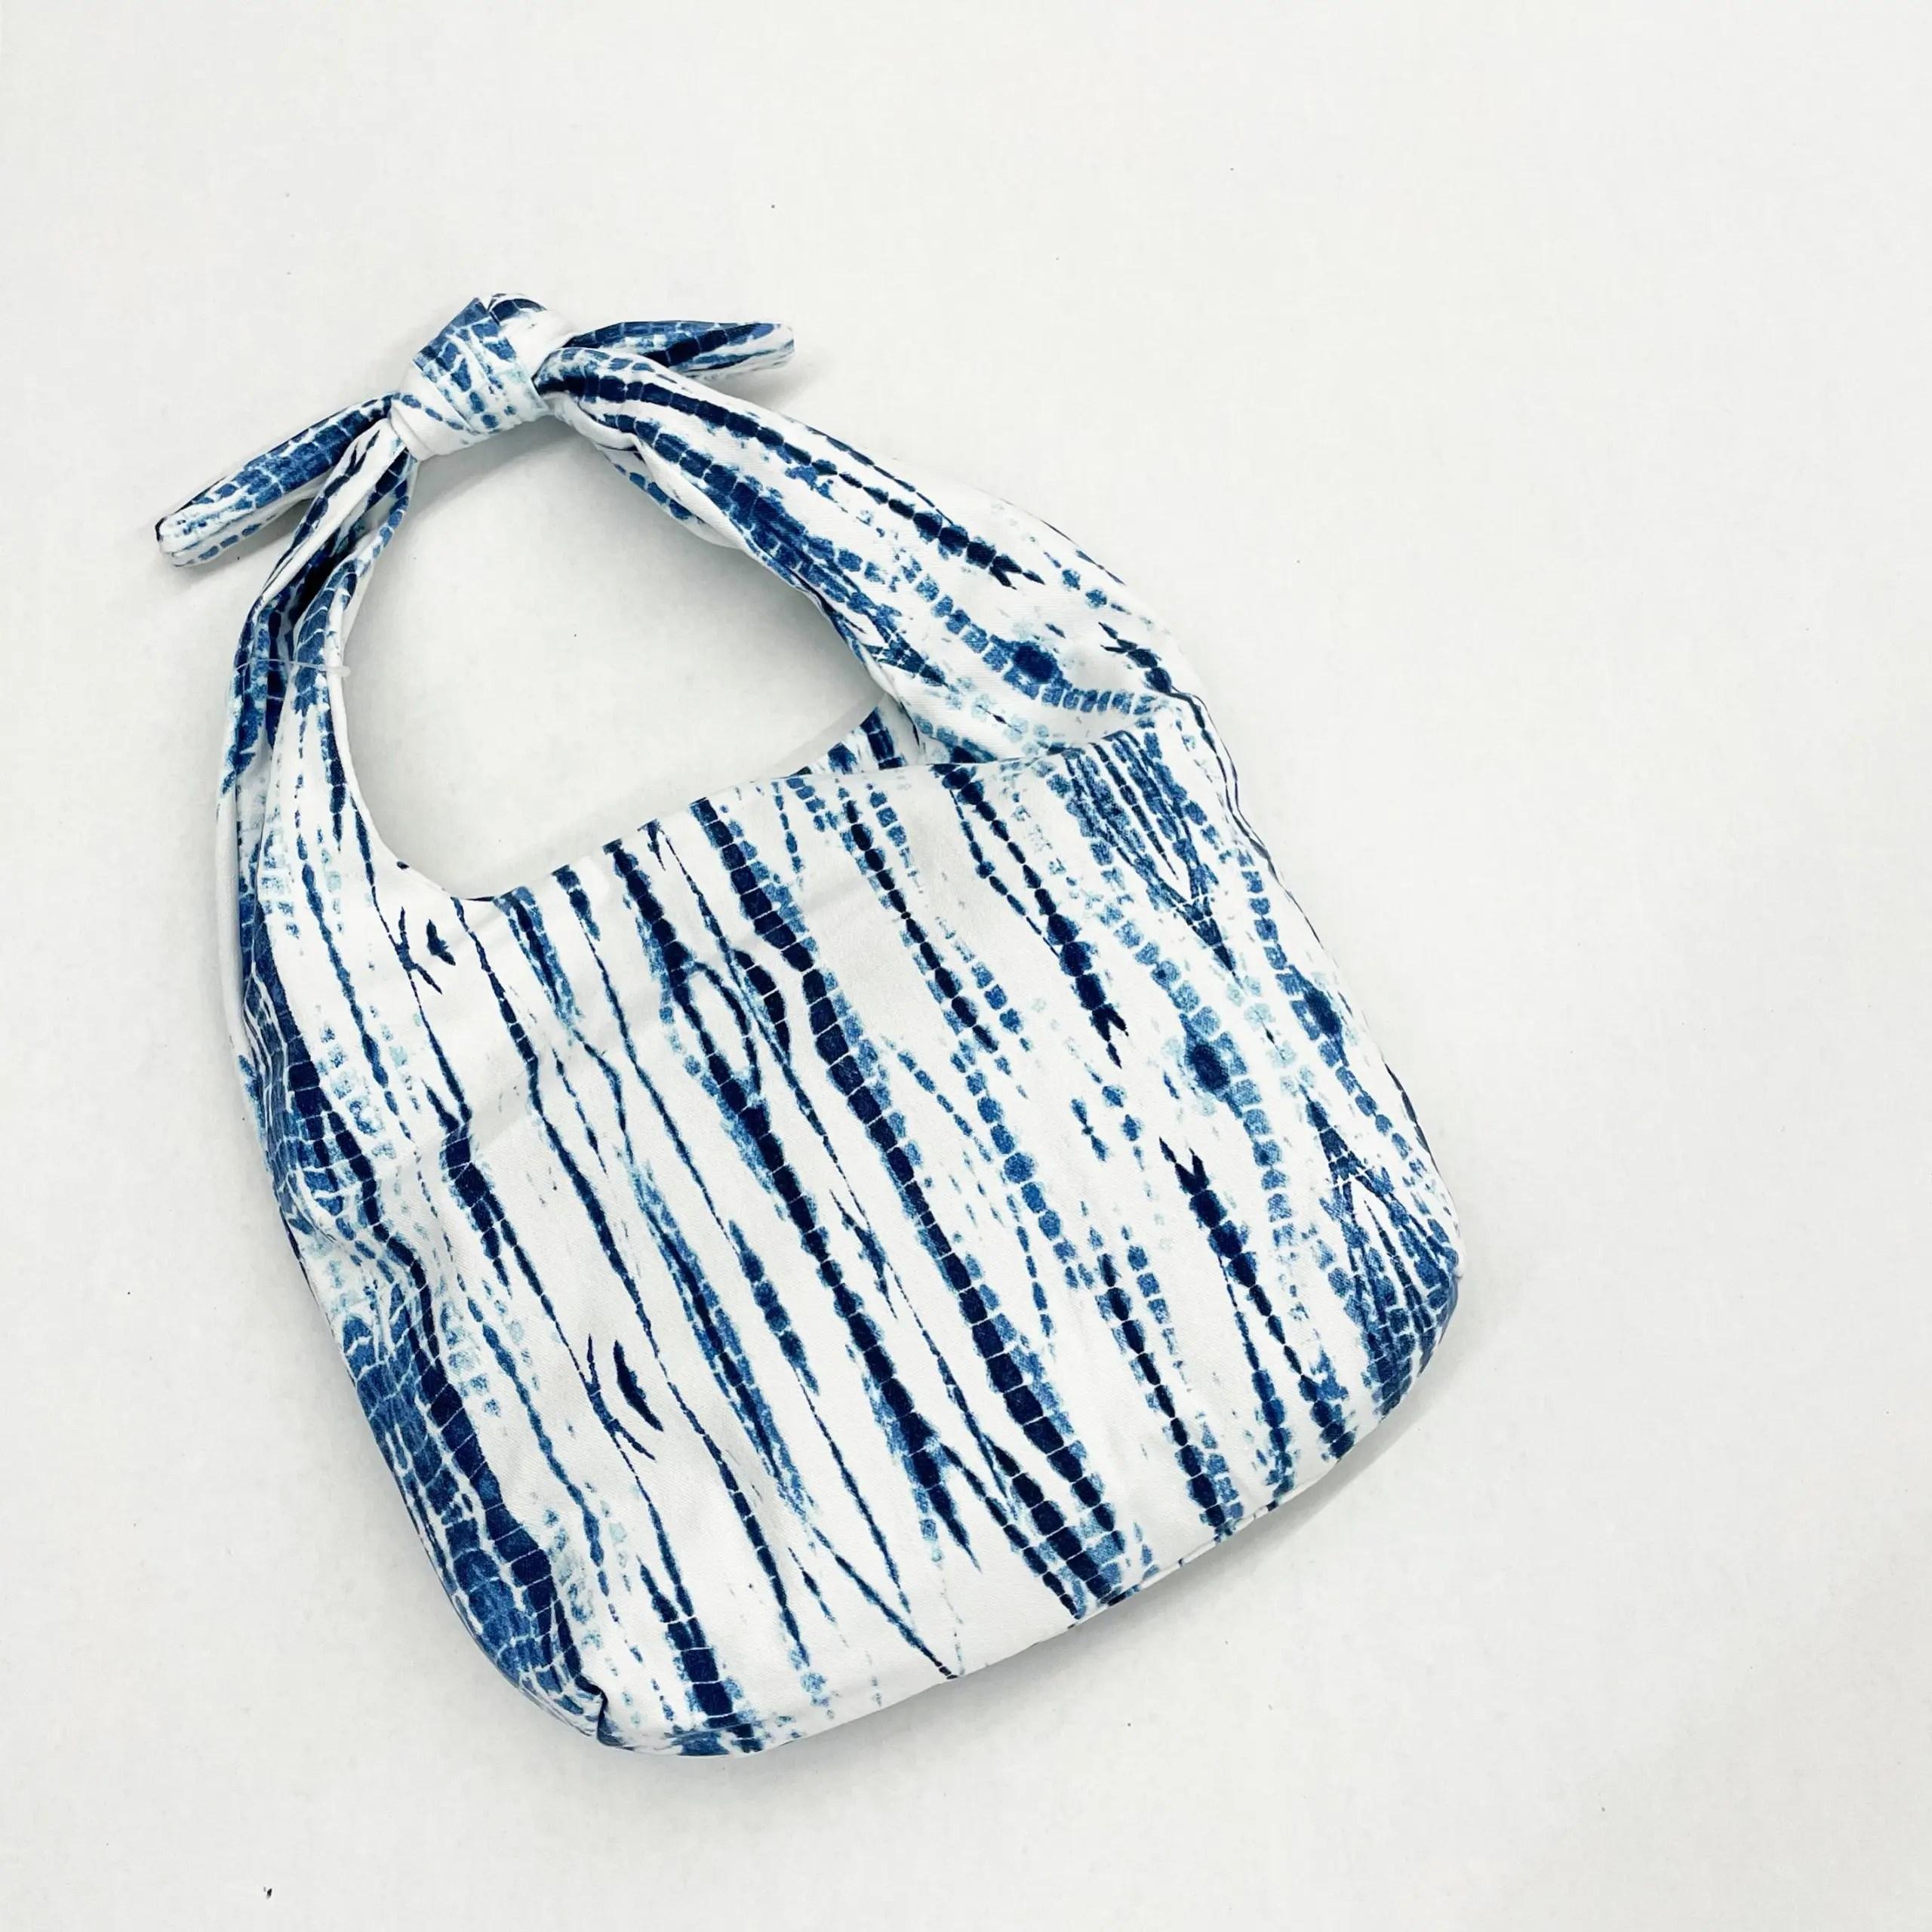 Time and Tru Tie Dye Hobo Bag with Inside Zipper Pocket